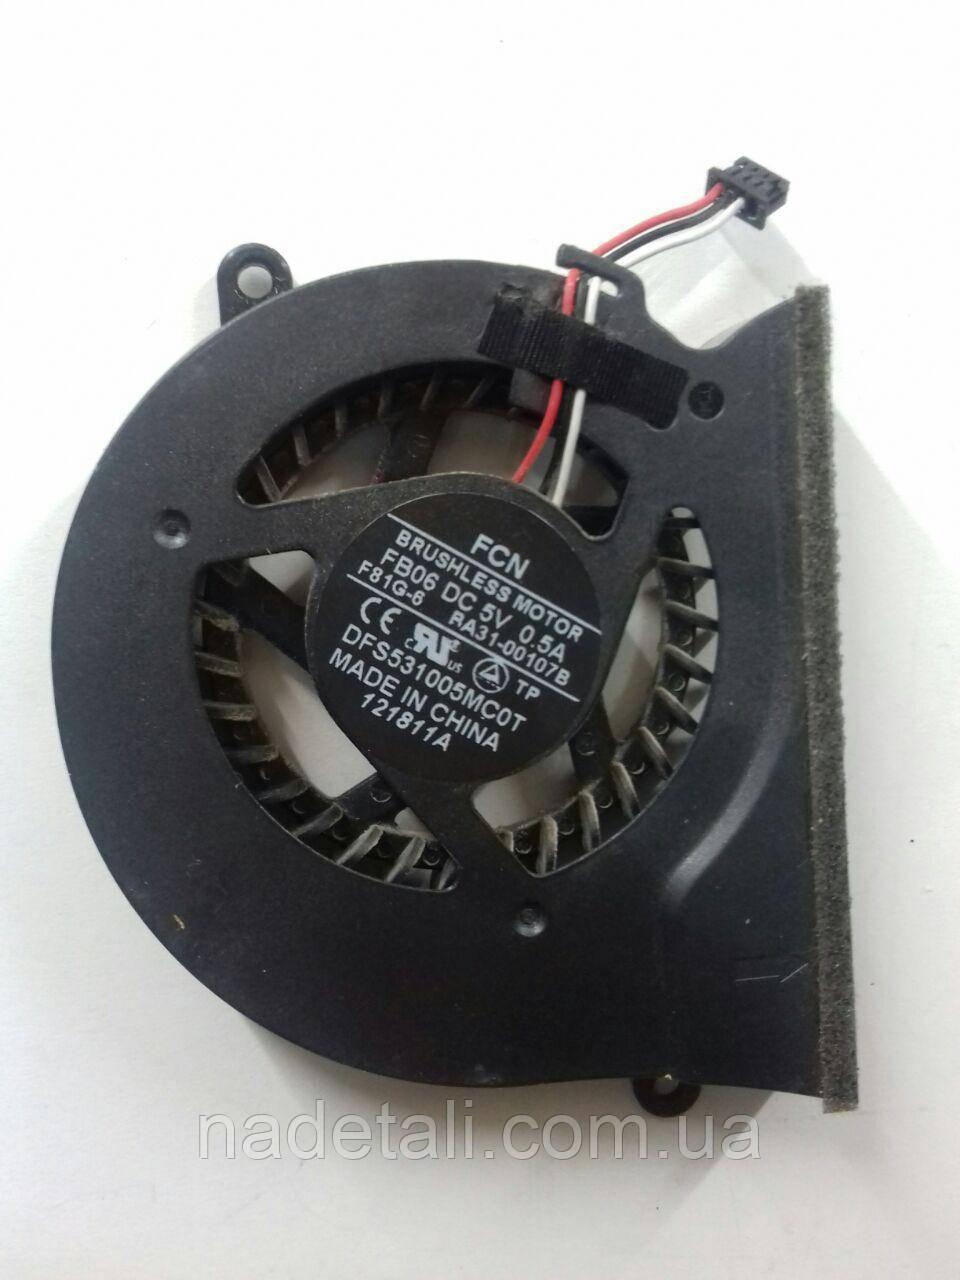 Система охлаждения (кулер) Samsung NP305E5Z BA31-00107B 4pin